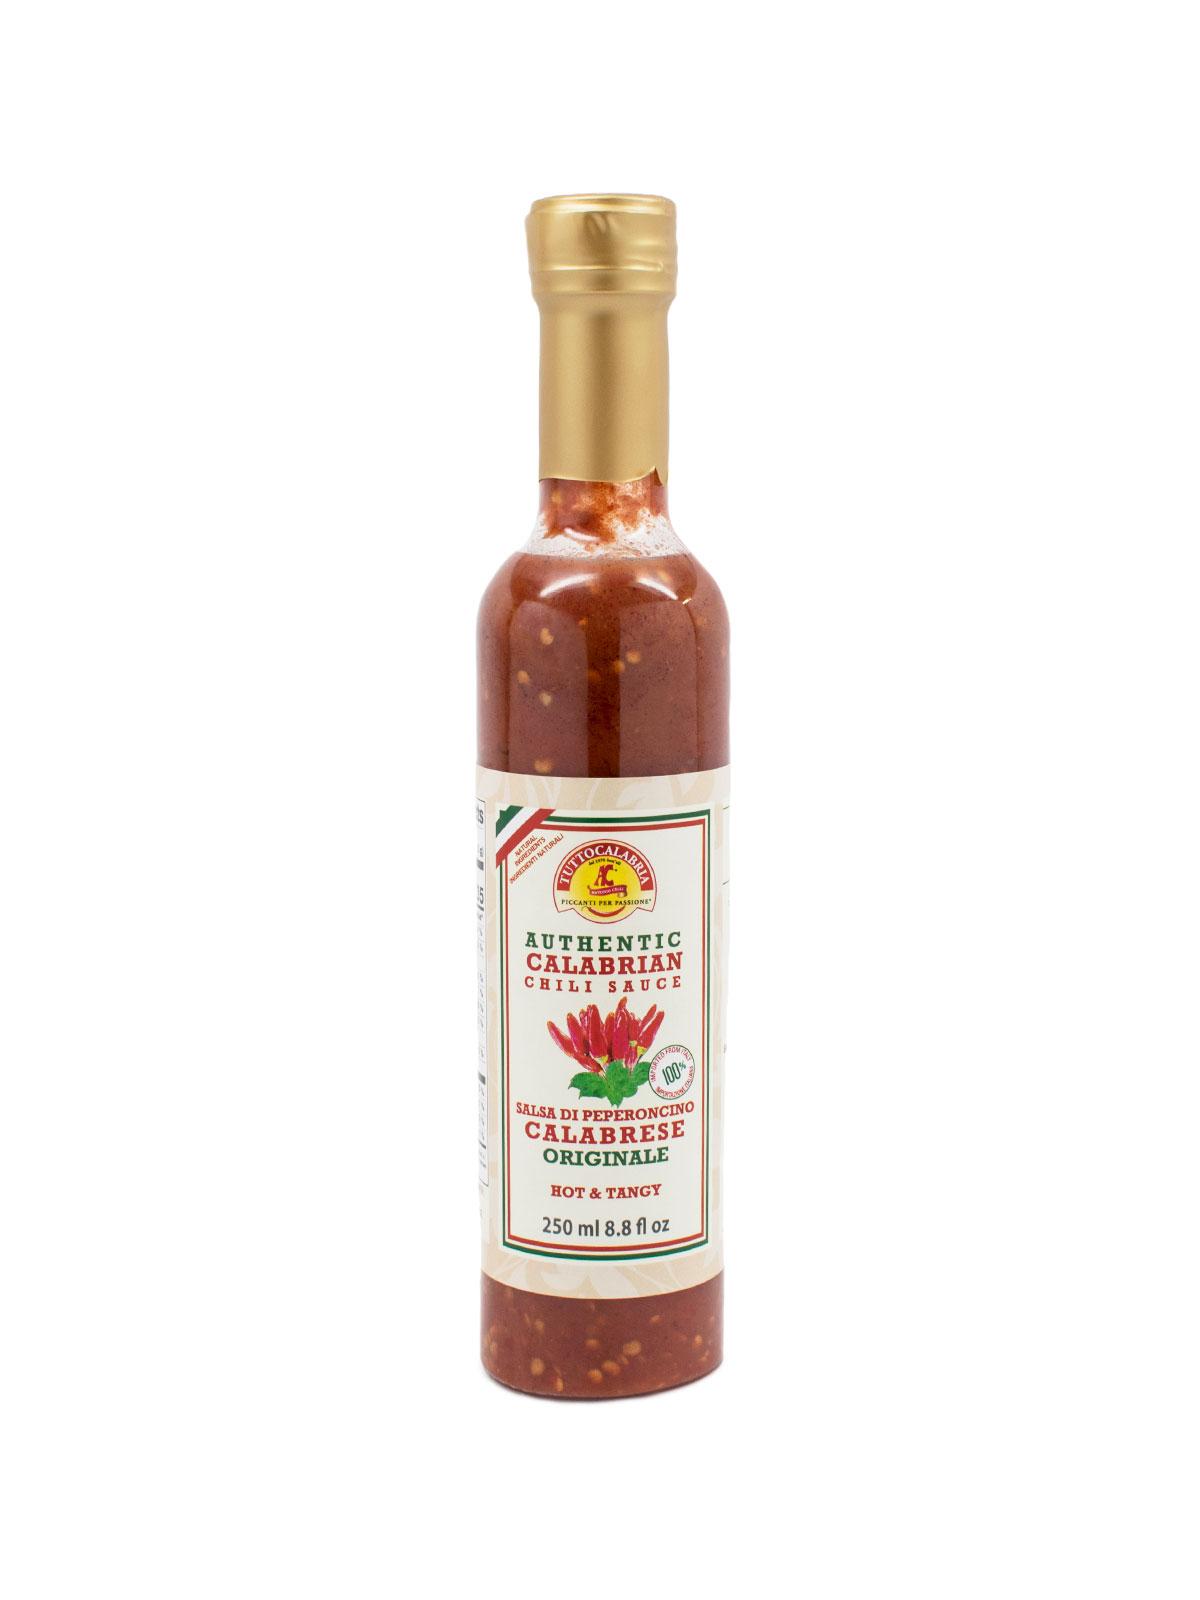 Authentic Calabrian Chili Sauce - Pantry - Buon'Italia